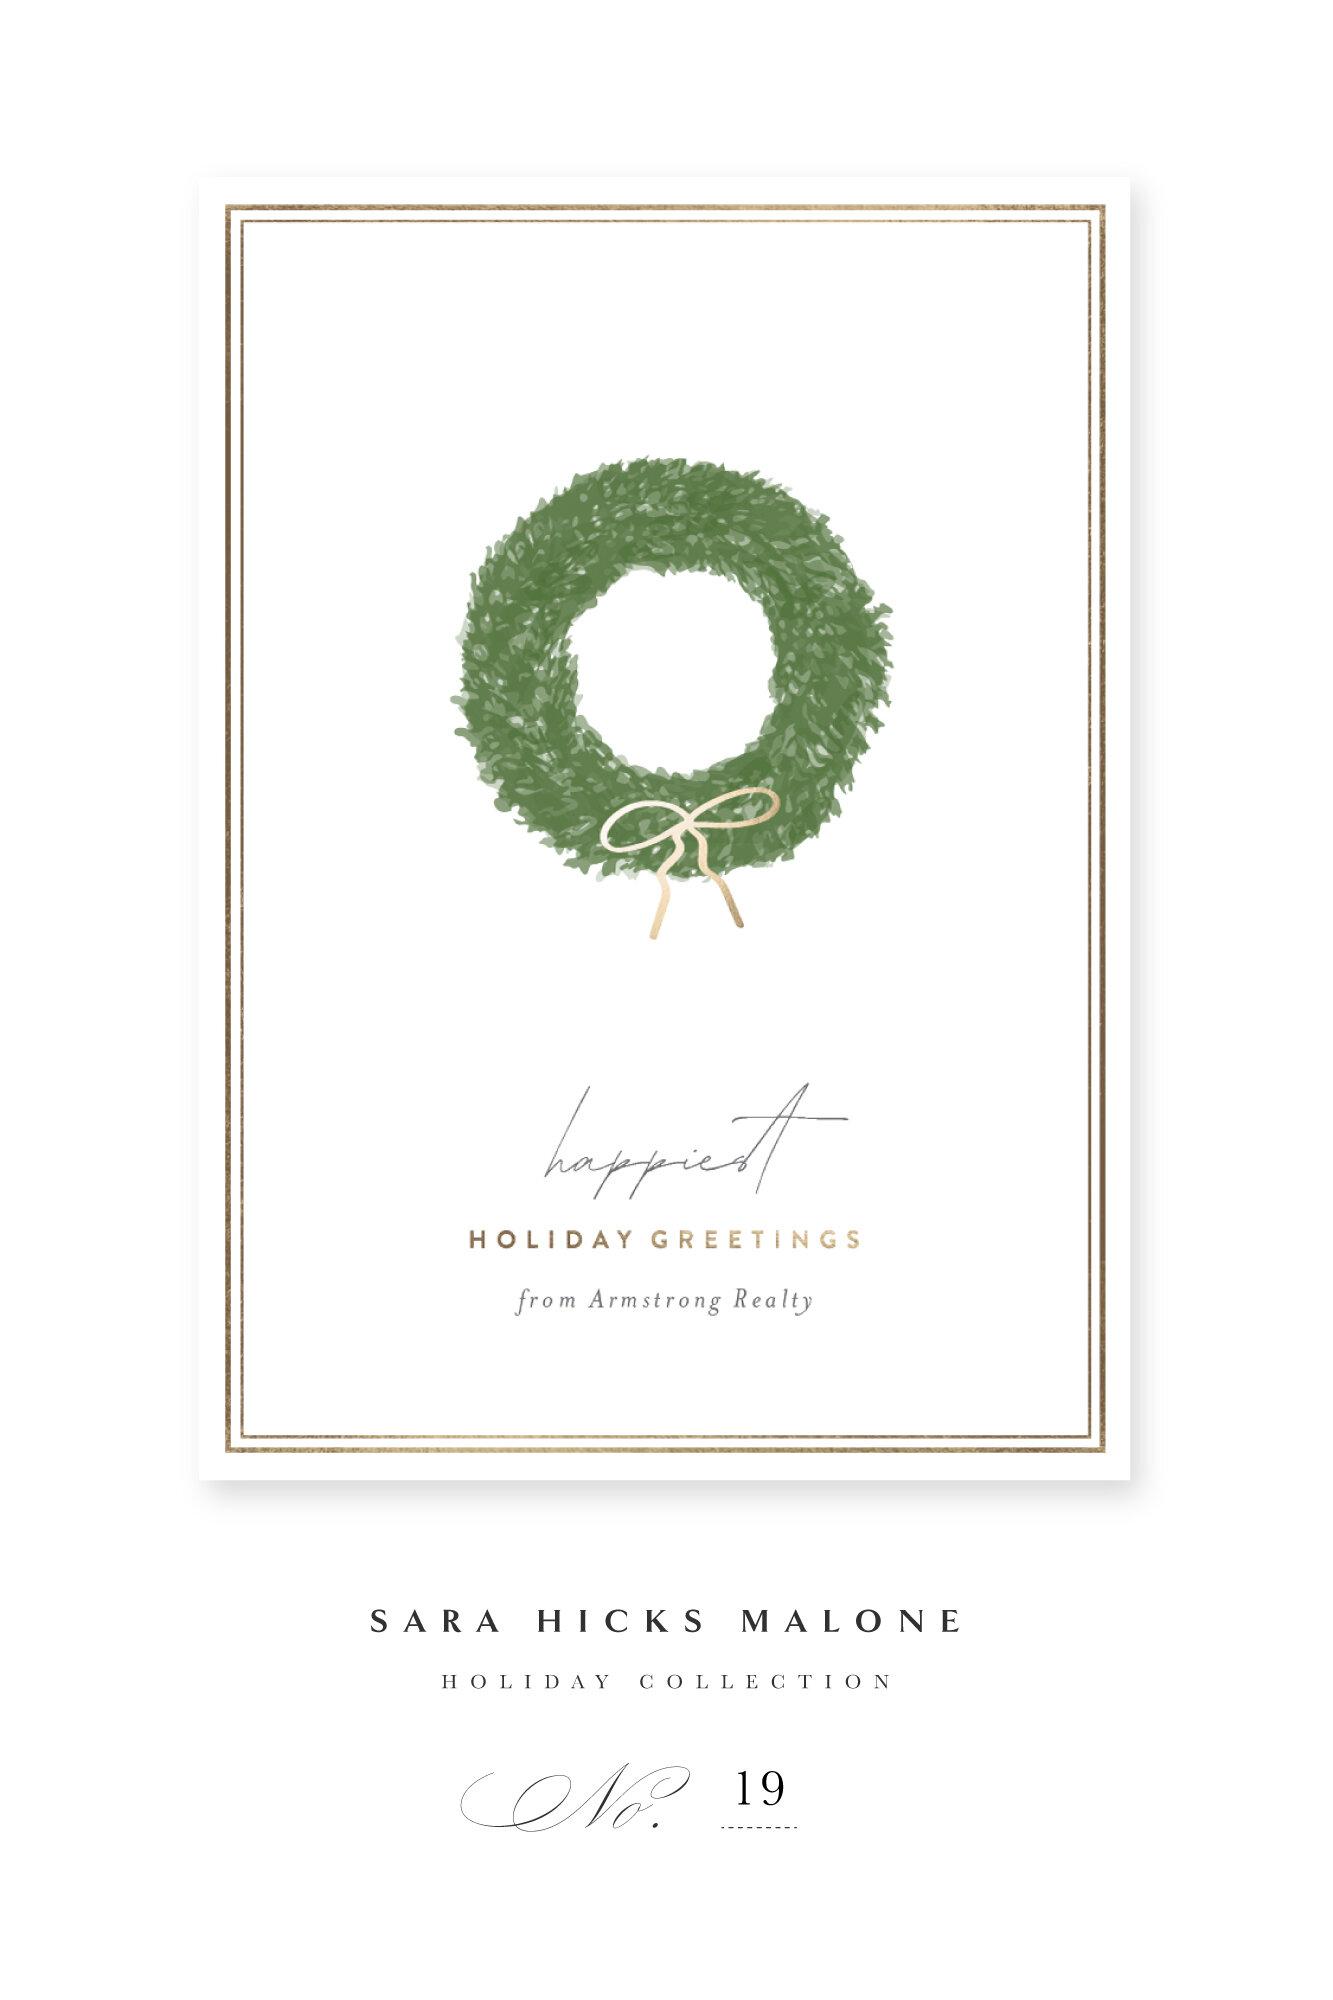 'SIMPLE WREATH' by Sara Hicks Malone